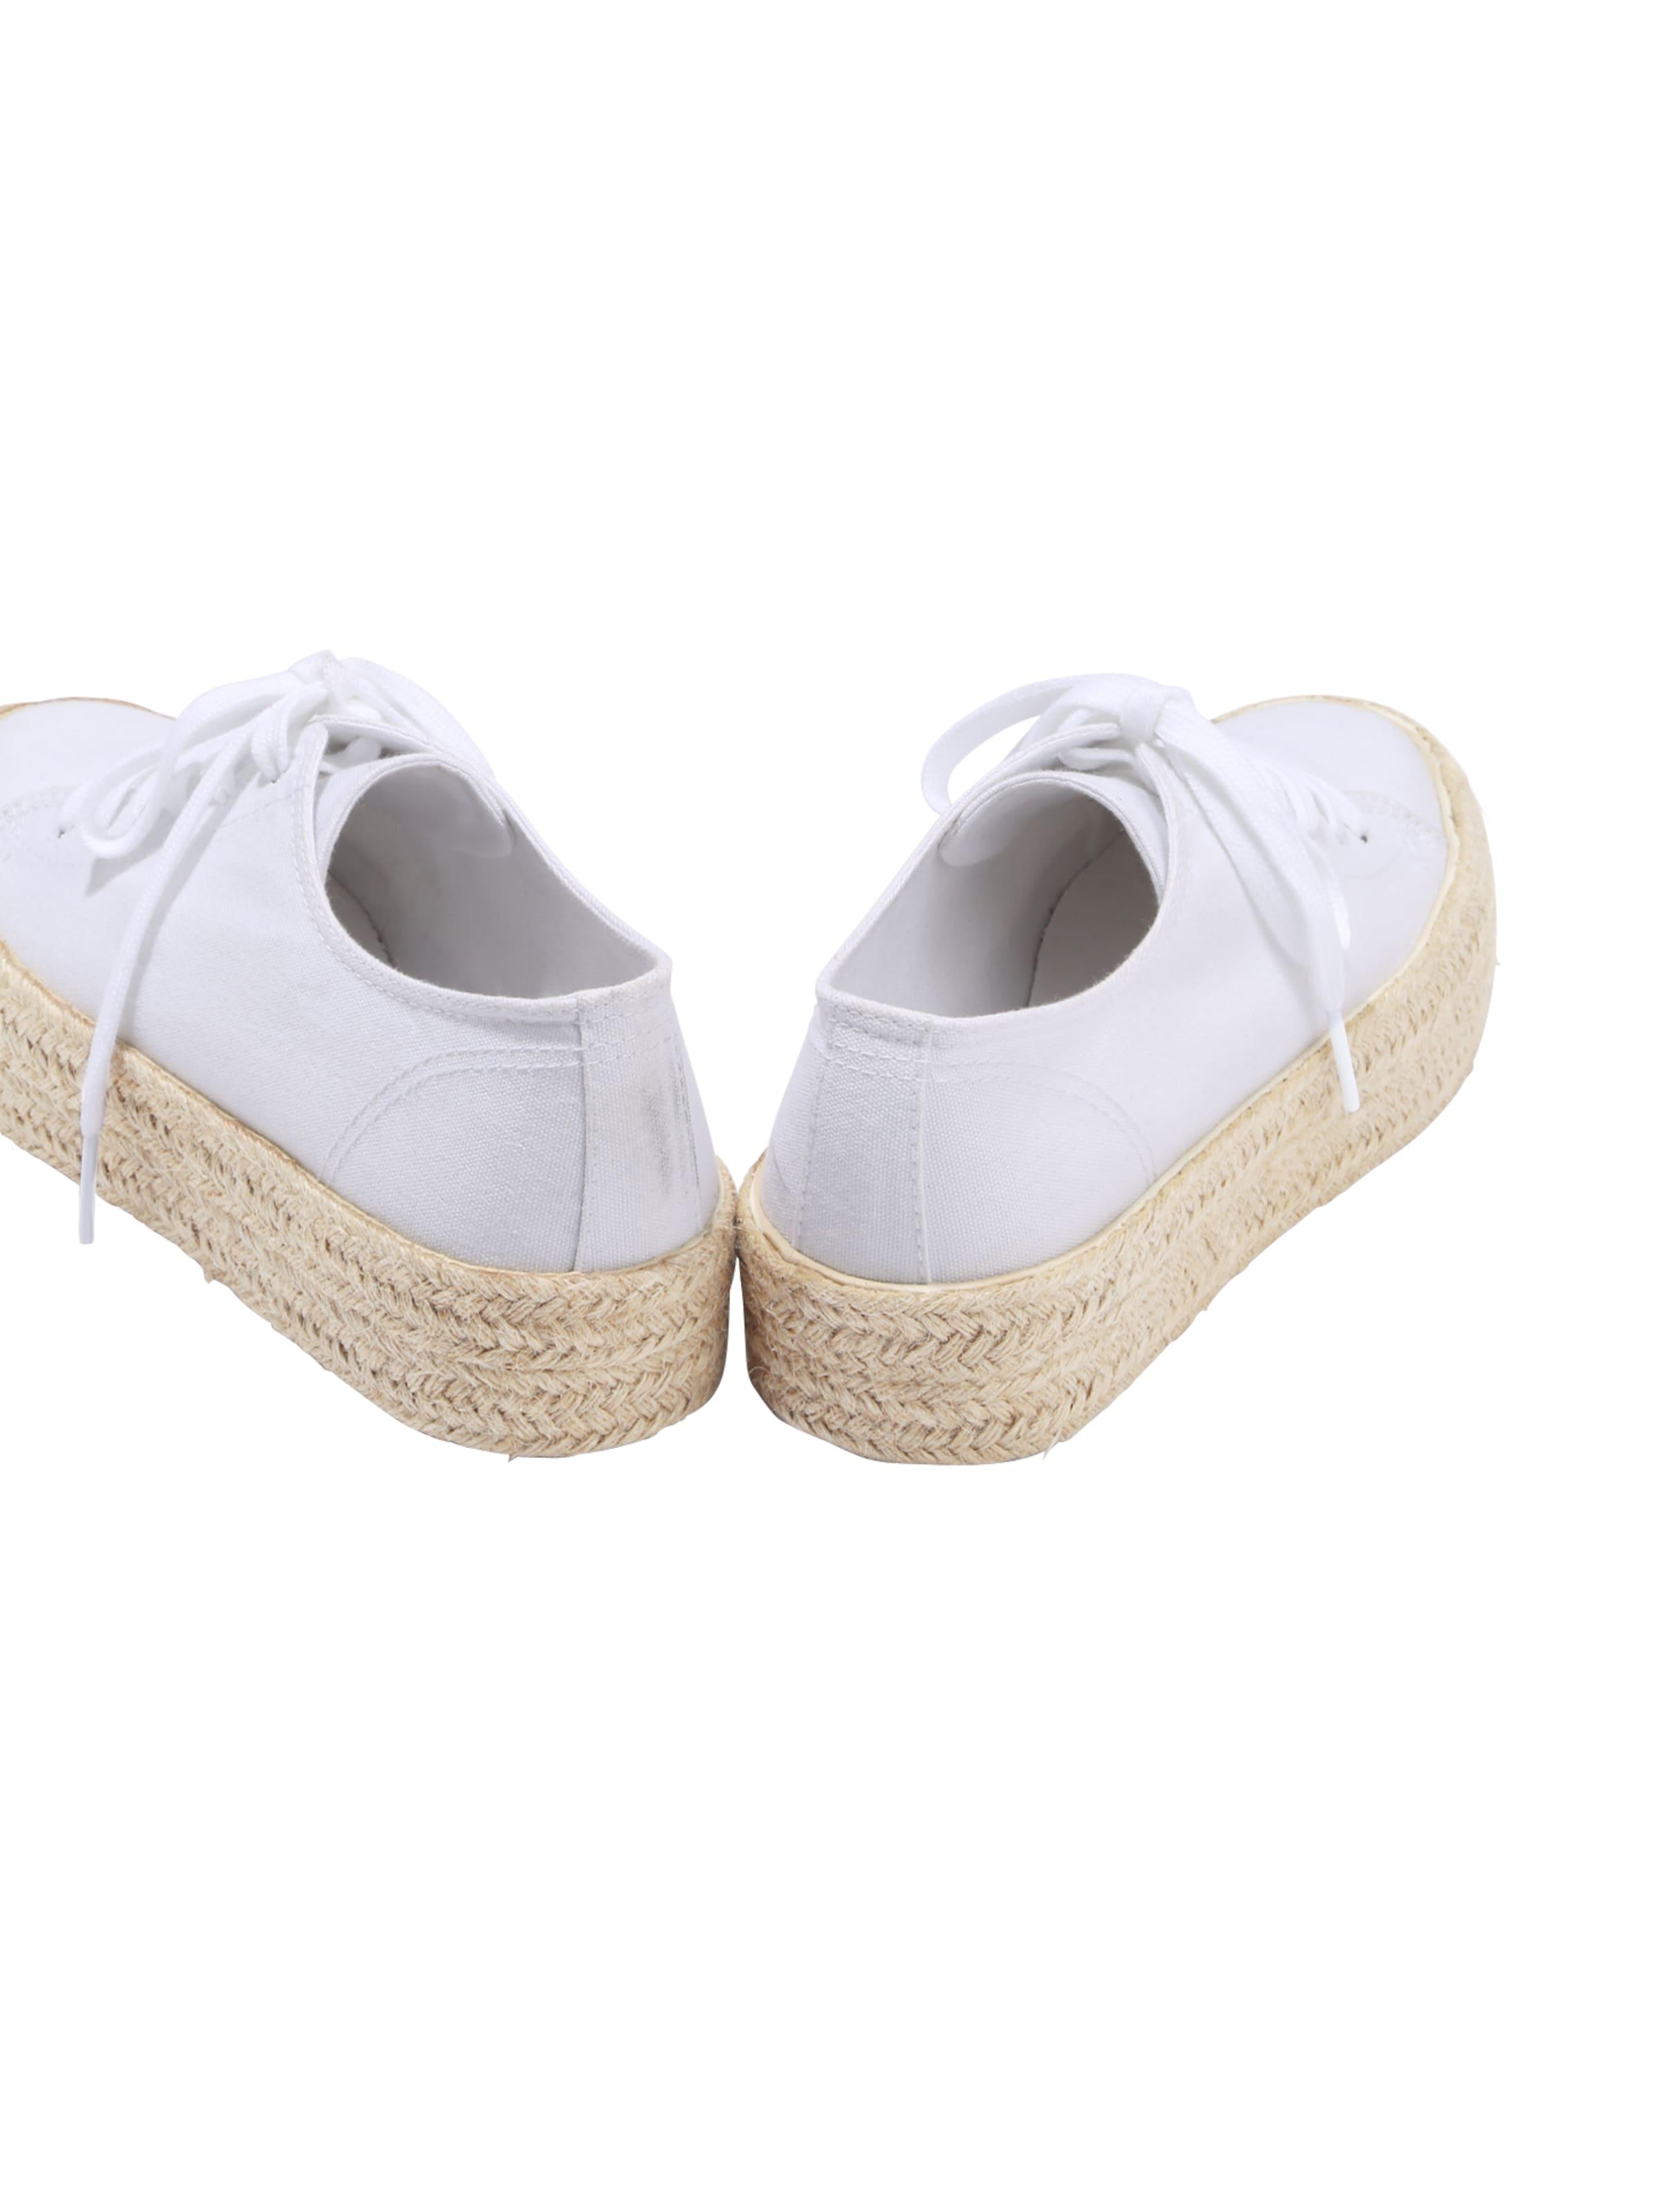 'malia' Blanc About Chaussure En You Lacets À PXuOZikT